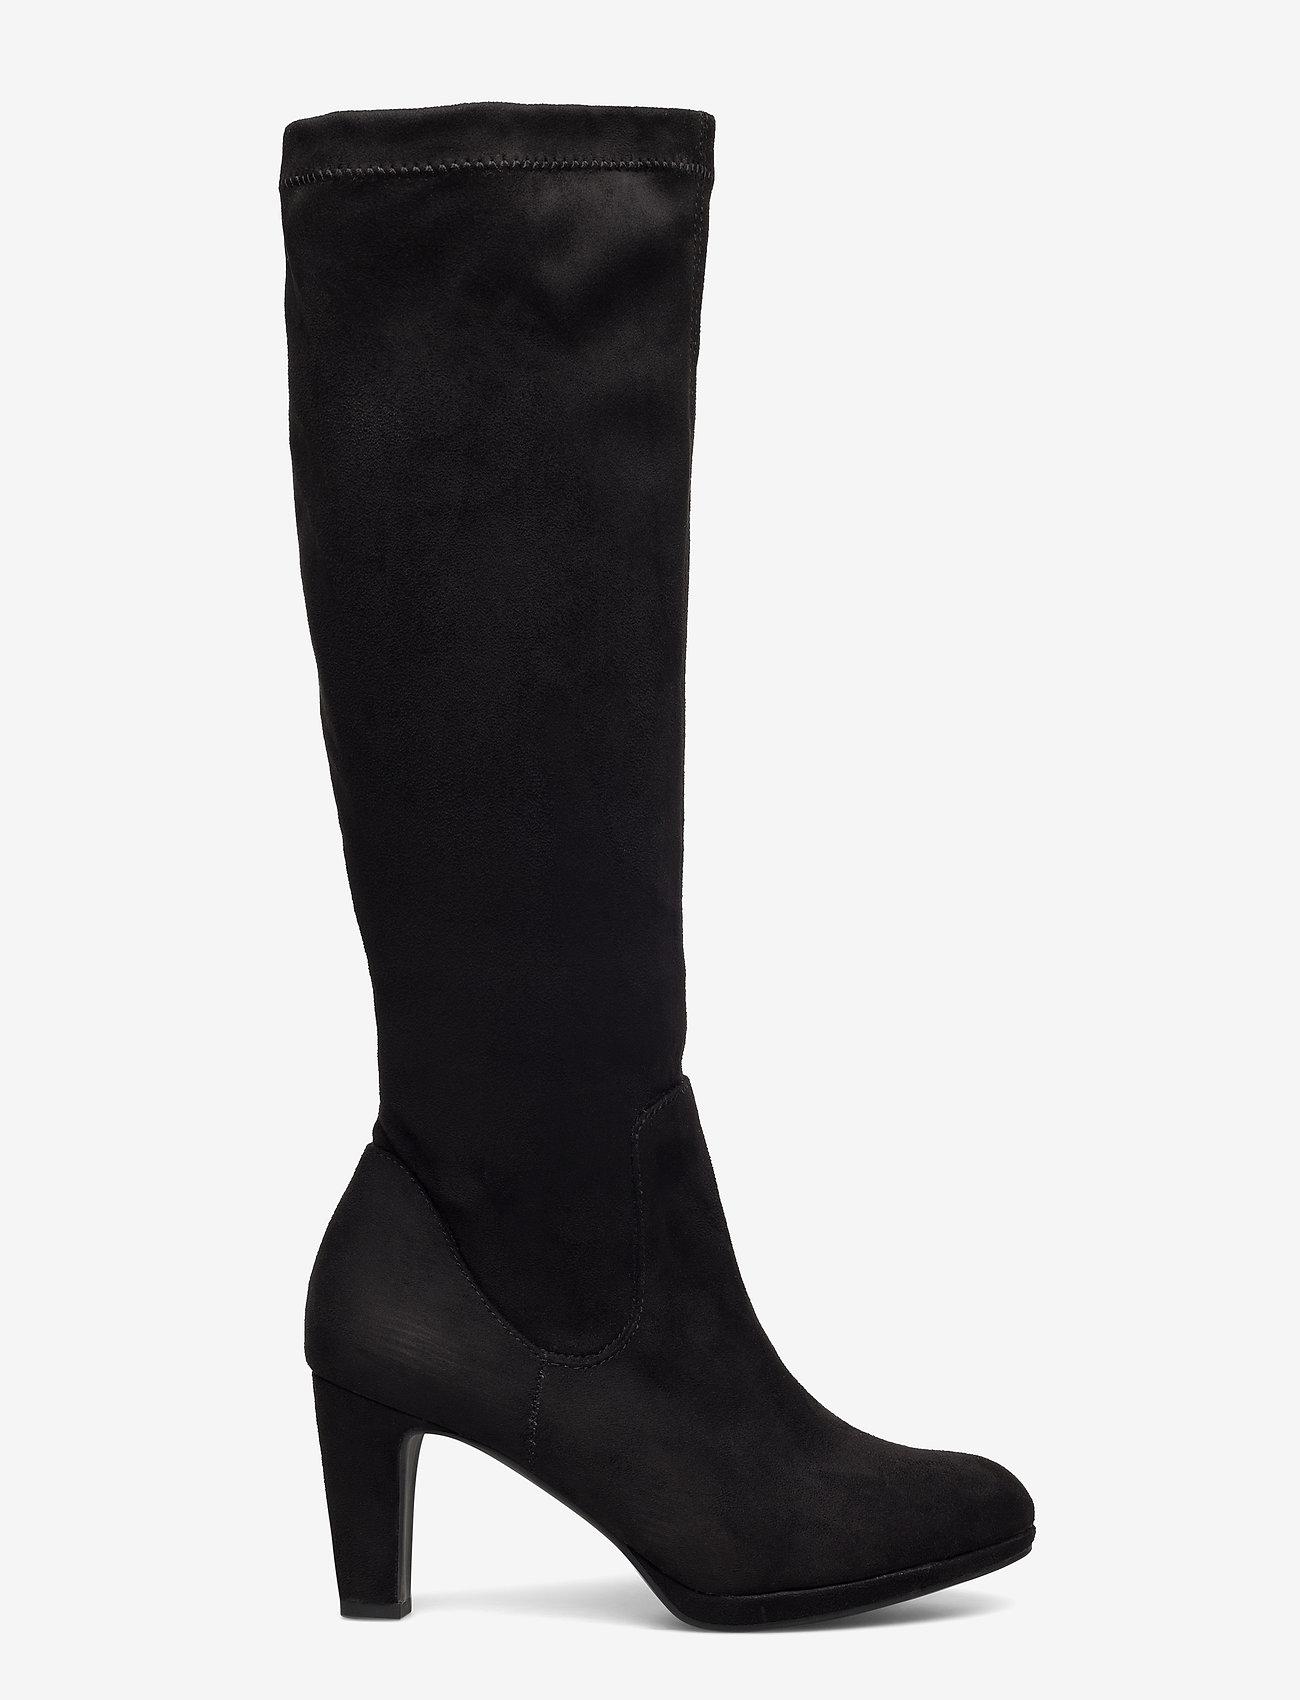 Tamaris - Woms Boots - Moffen - garie zābaki - black - 1